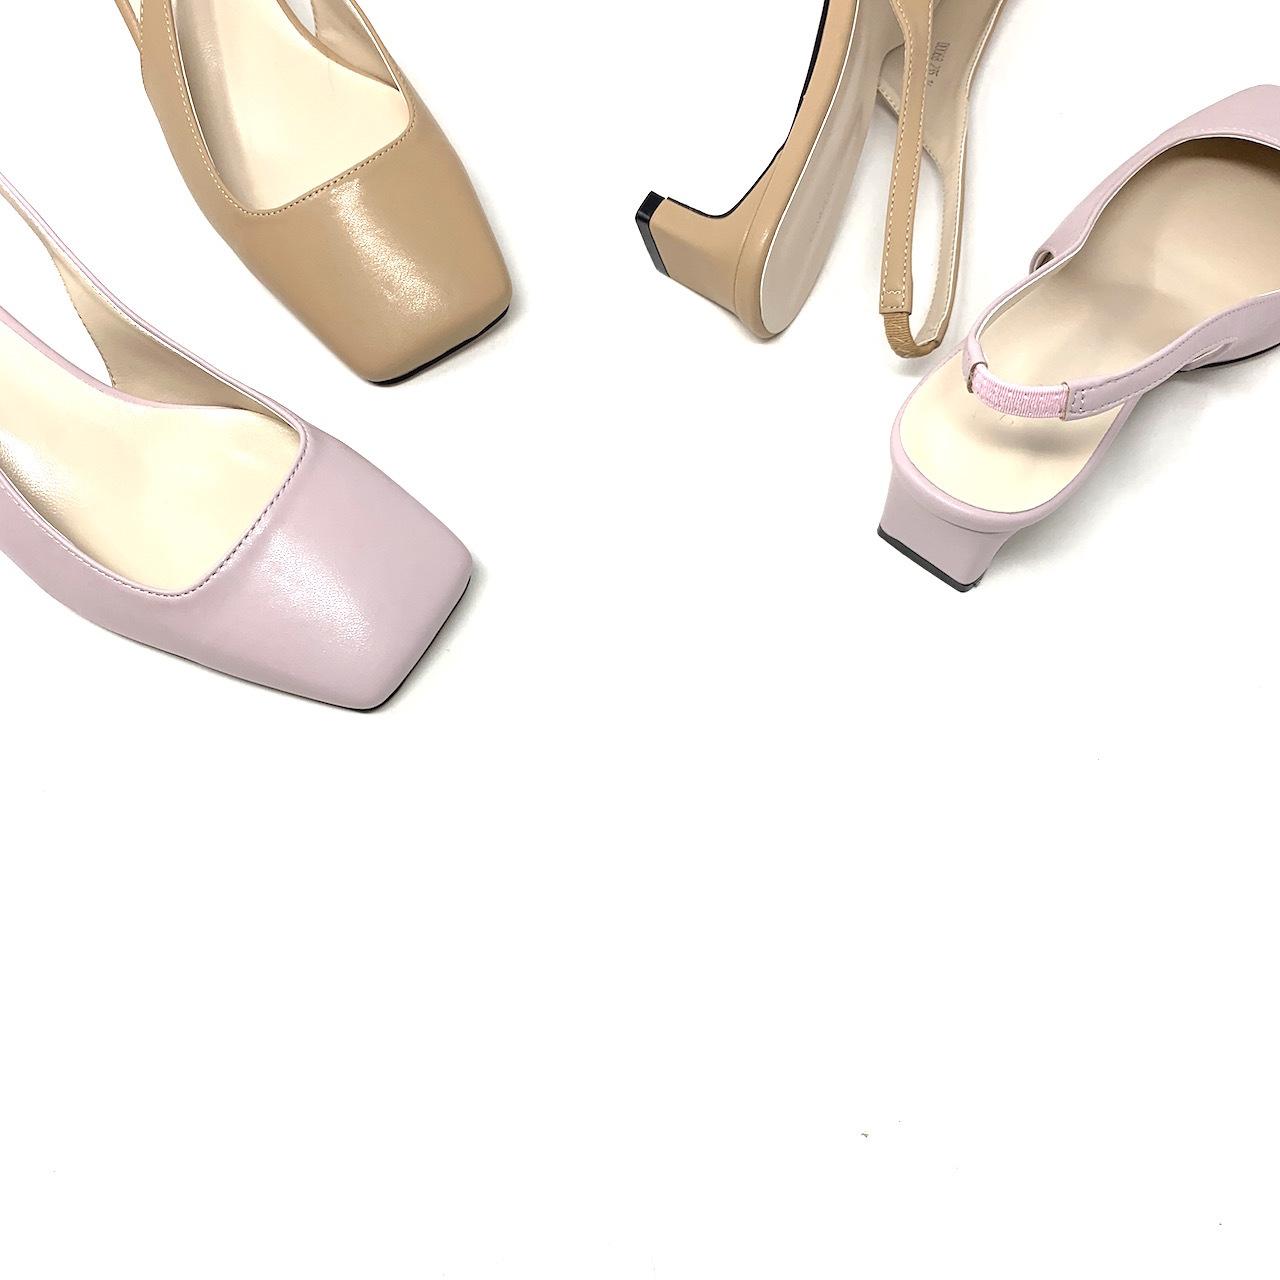 Square set back heel BB Pumps  スクエアトゥ・バックオープンパンプス  #kr0017